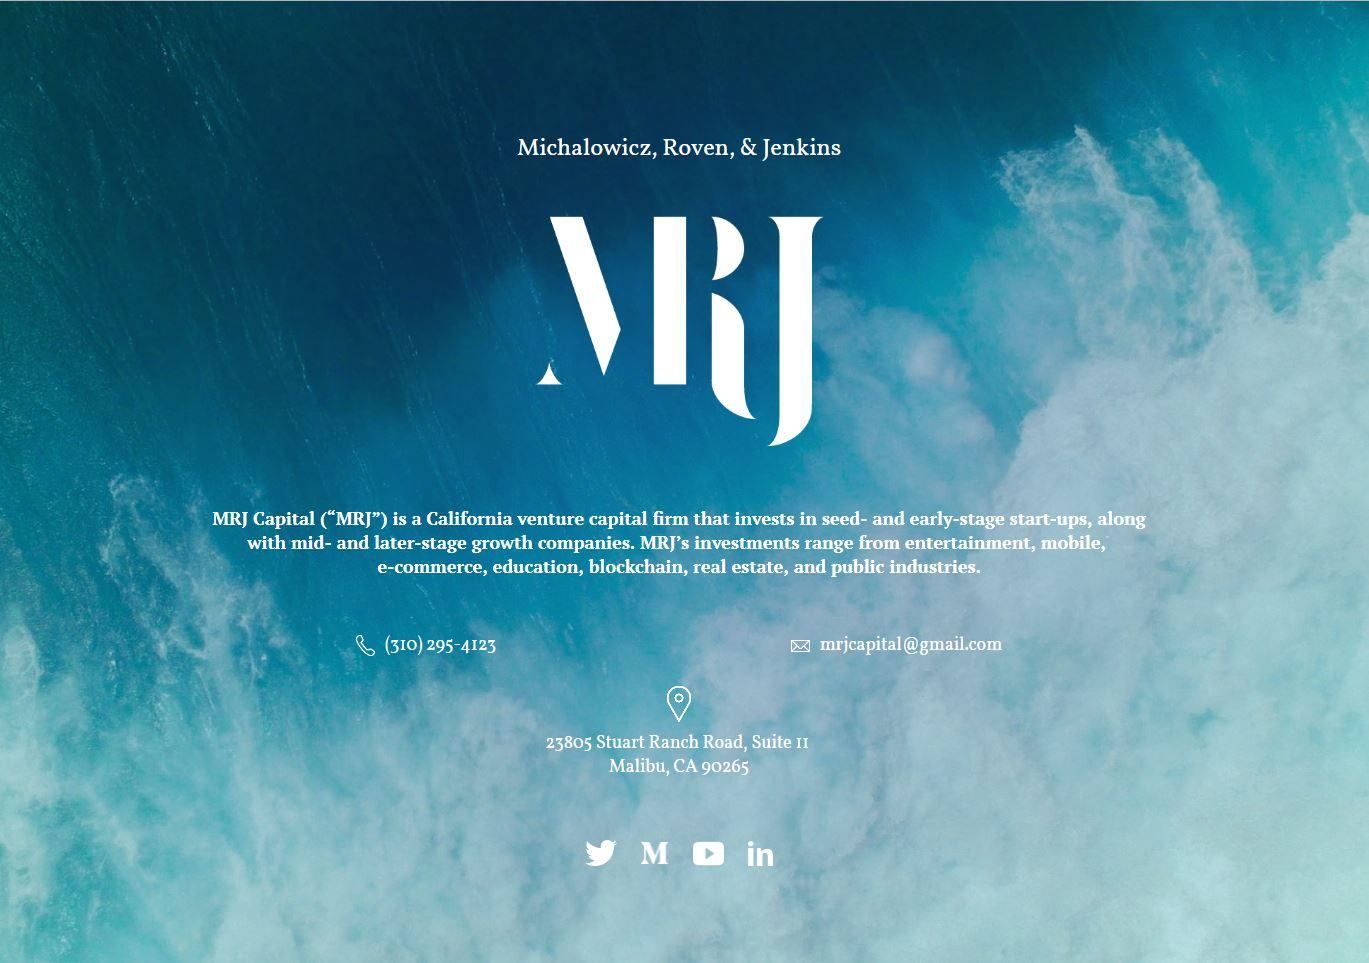 MRJ Capital designed by Alisha Rosen